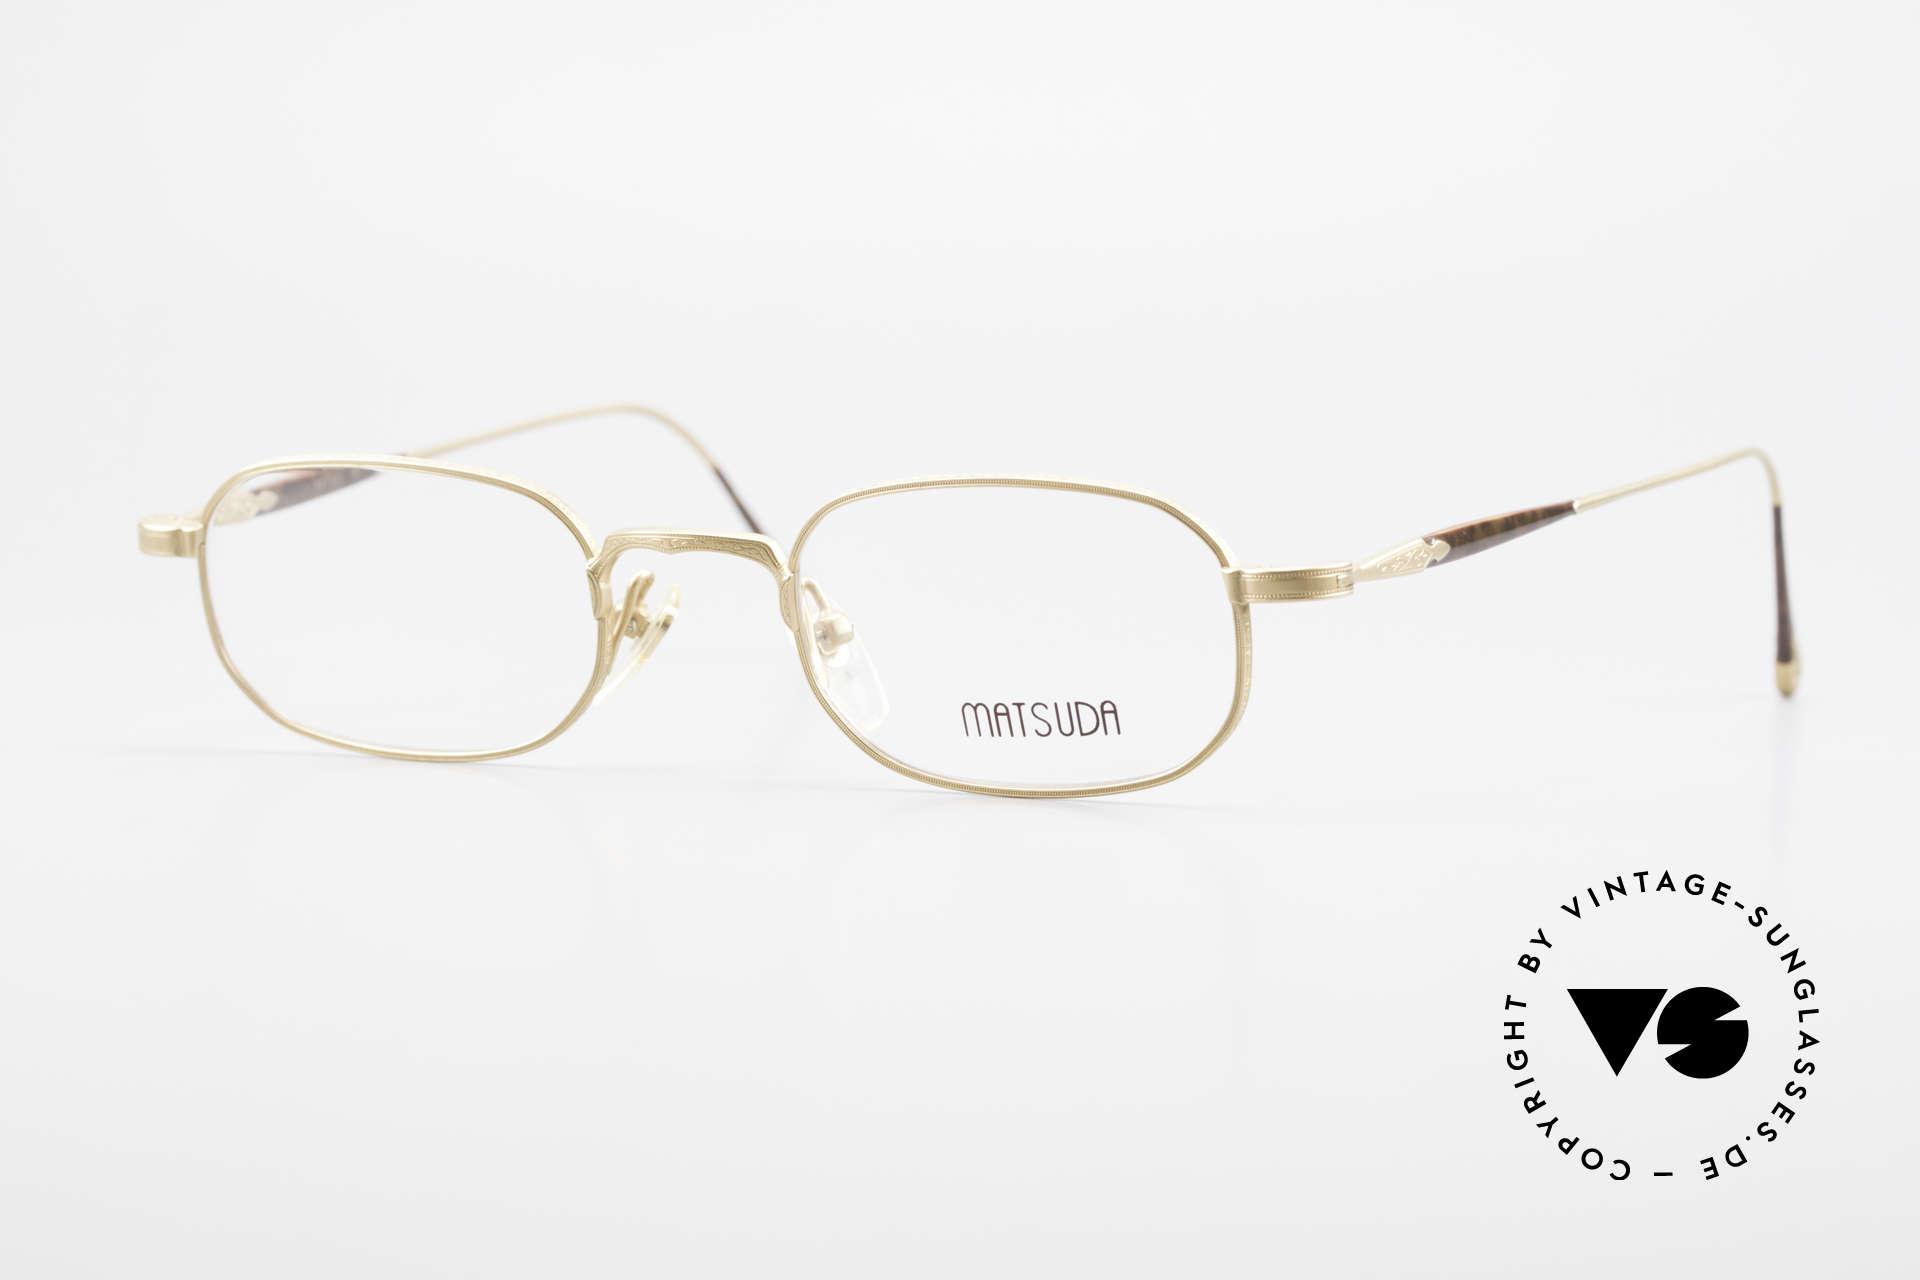 Matsuda 10108 Men's Eyeglasses 90's High End, vintage Matsuda designer eyeglasses from the mid 90's, Made for Men